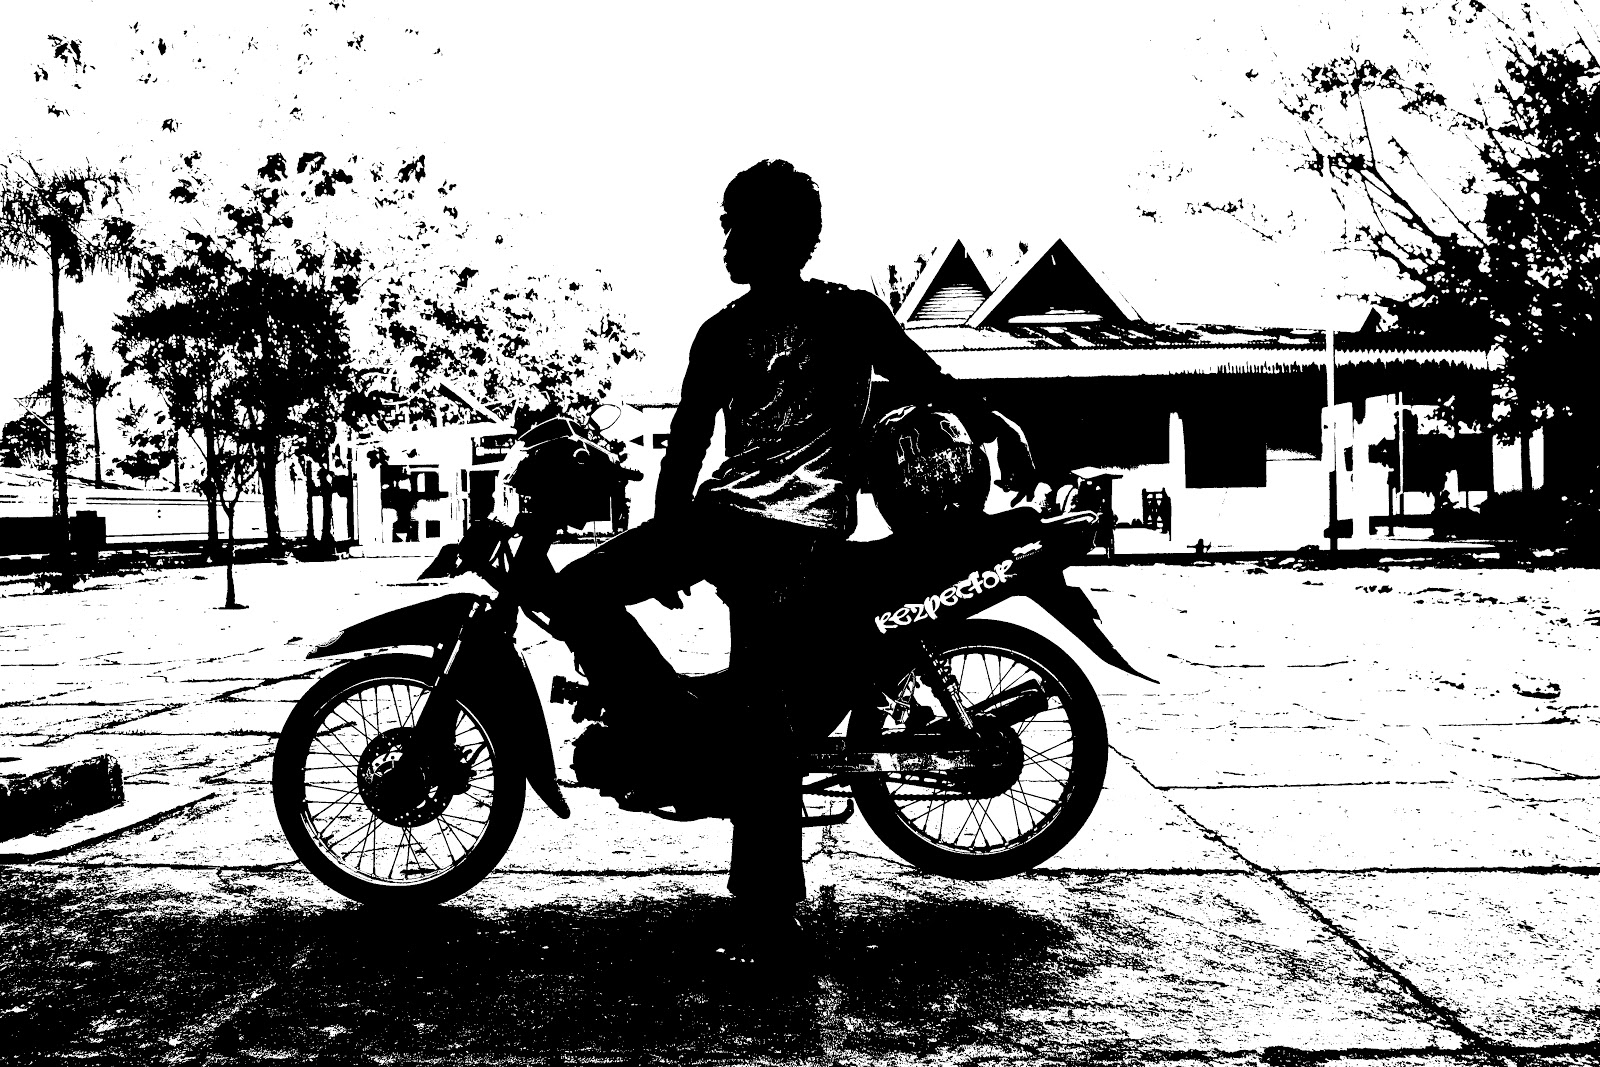 Sii Jangkrik November 2012